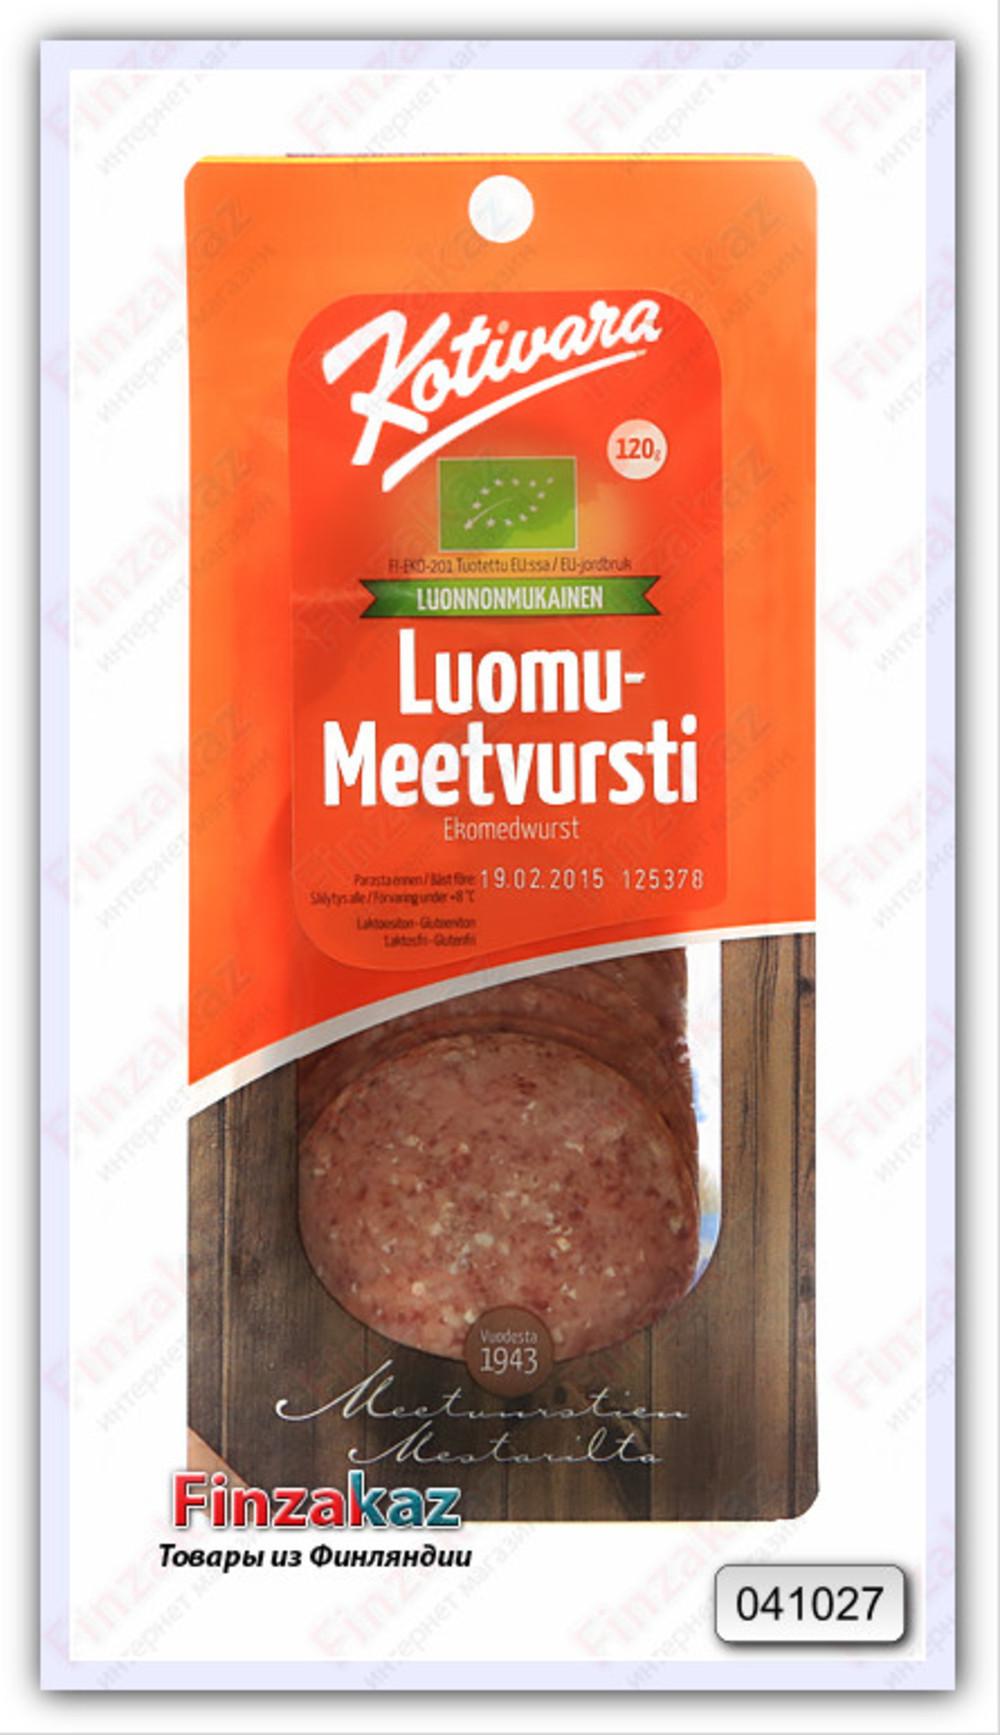 Салями Kotivara Luomumeetvursti (нарезка) 120 гр